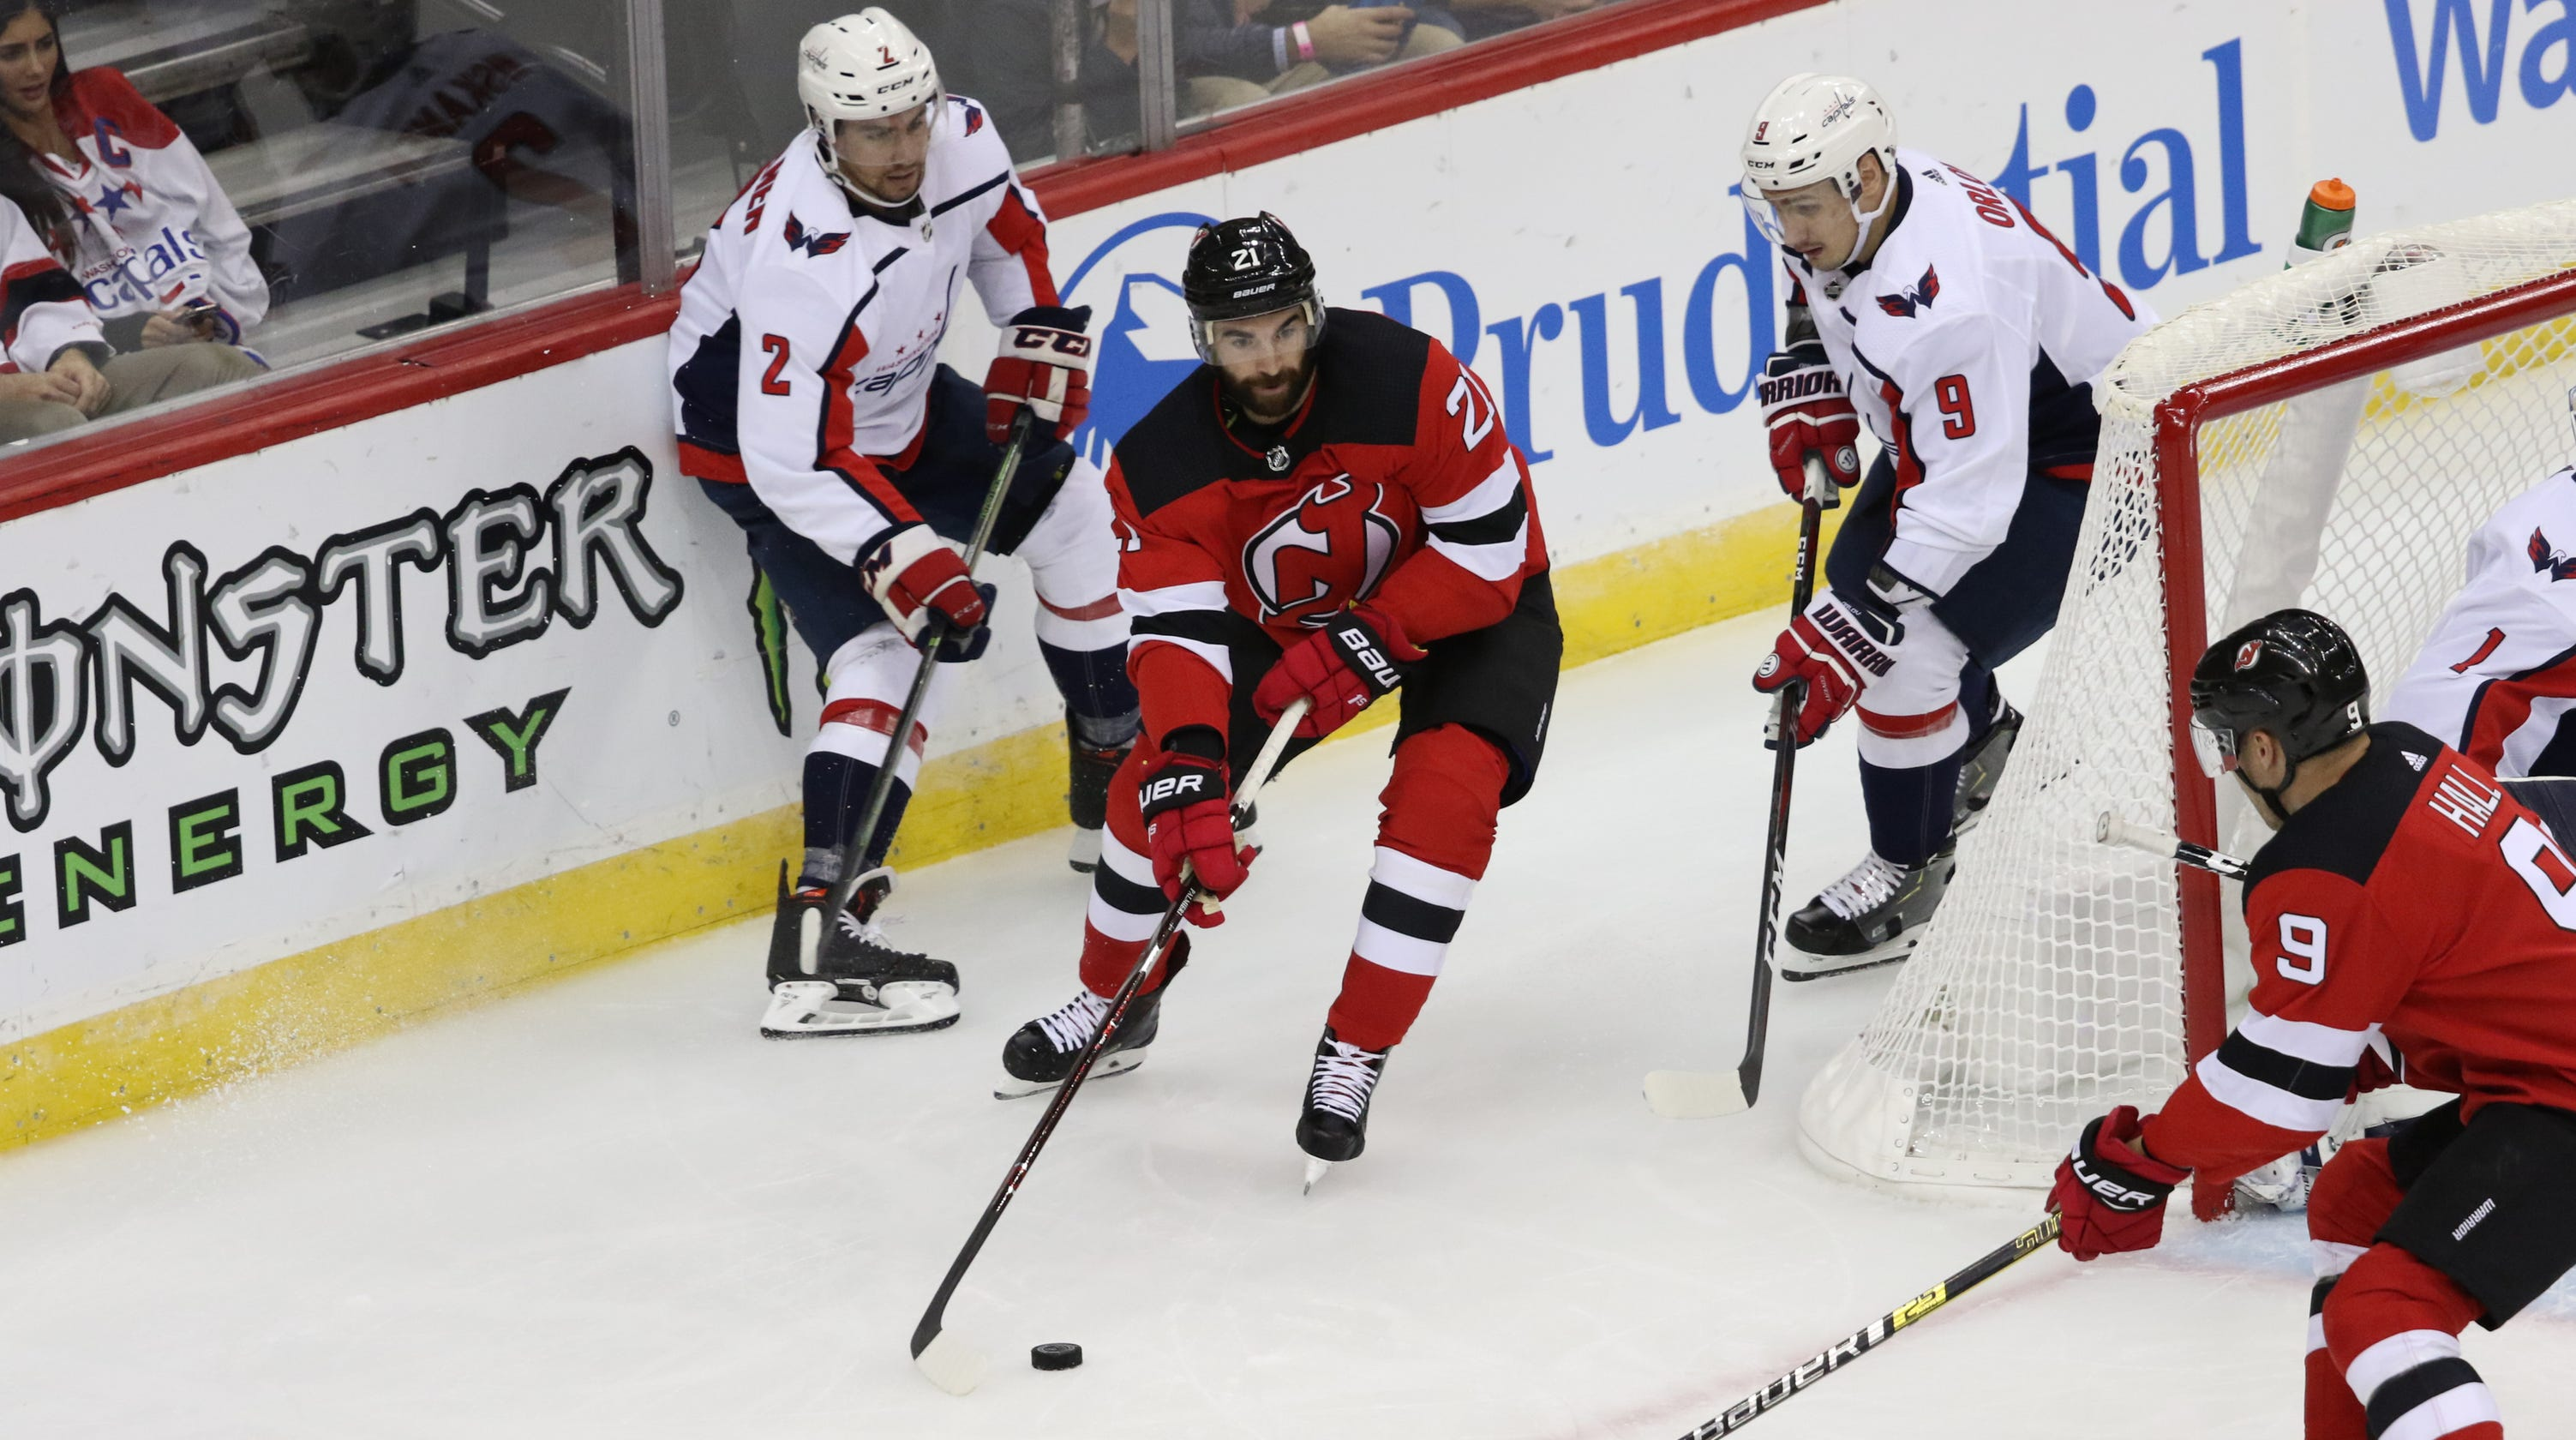 cheaper ad29d 42735 Kyle Palmieri's hot streak continues in NJ Devils' win over ...